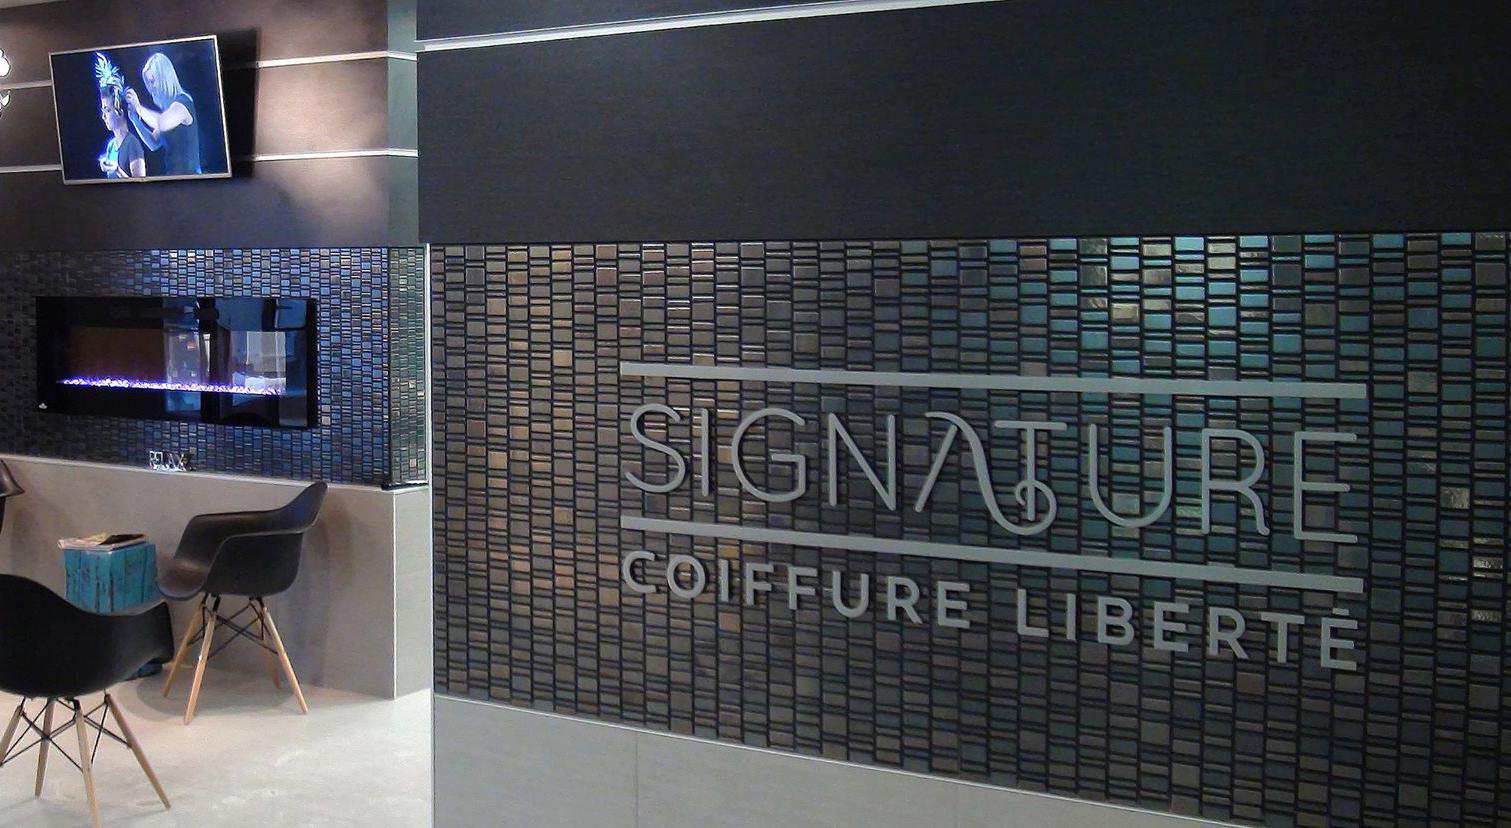 Signature Coiffure Liberté